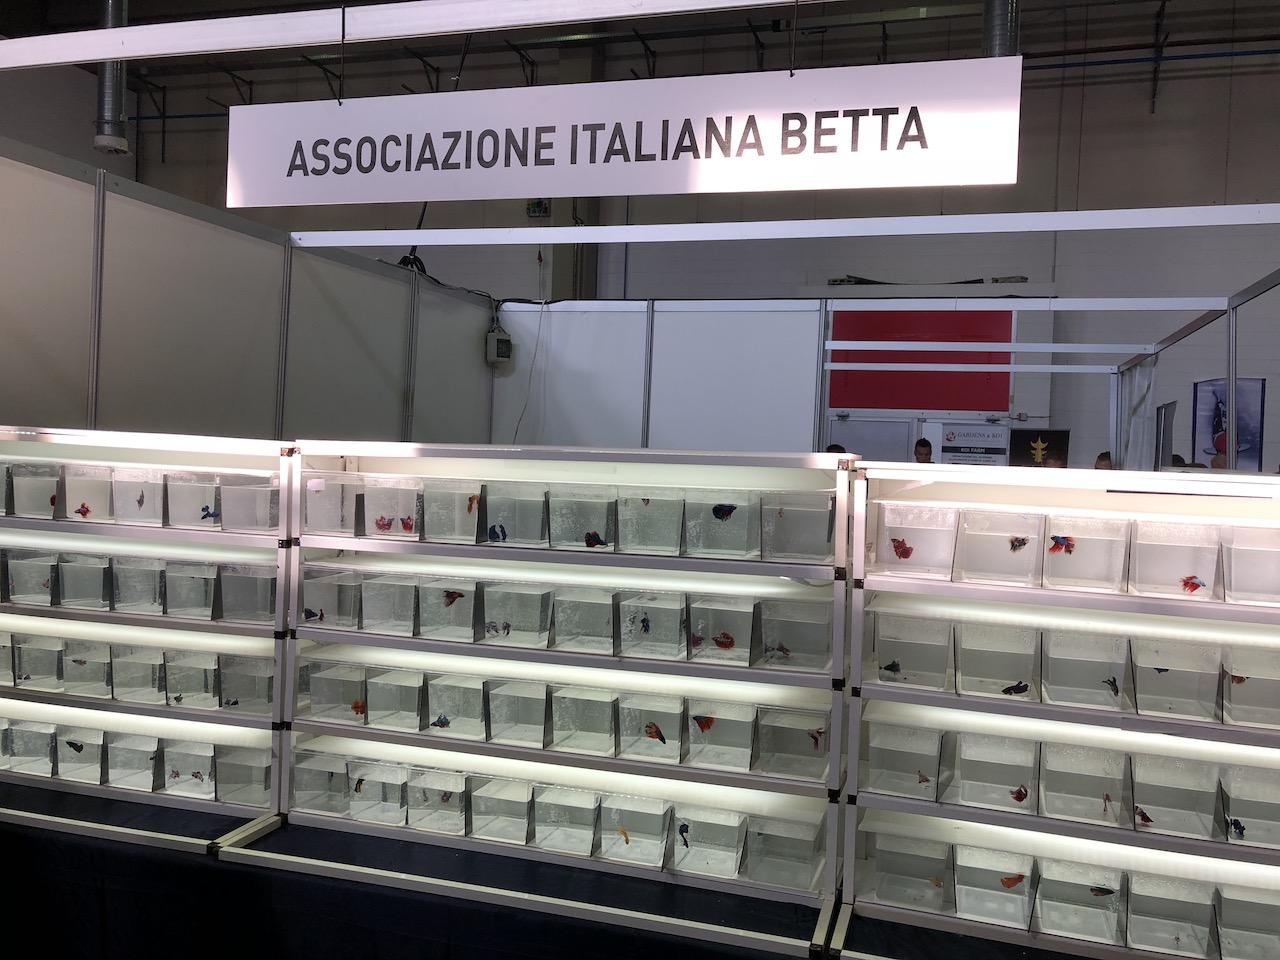 Associazione Italiana Betta 1